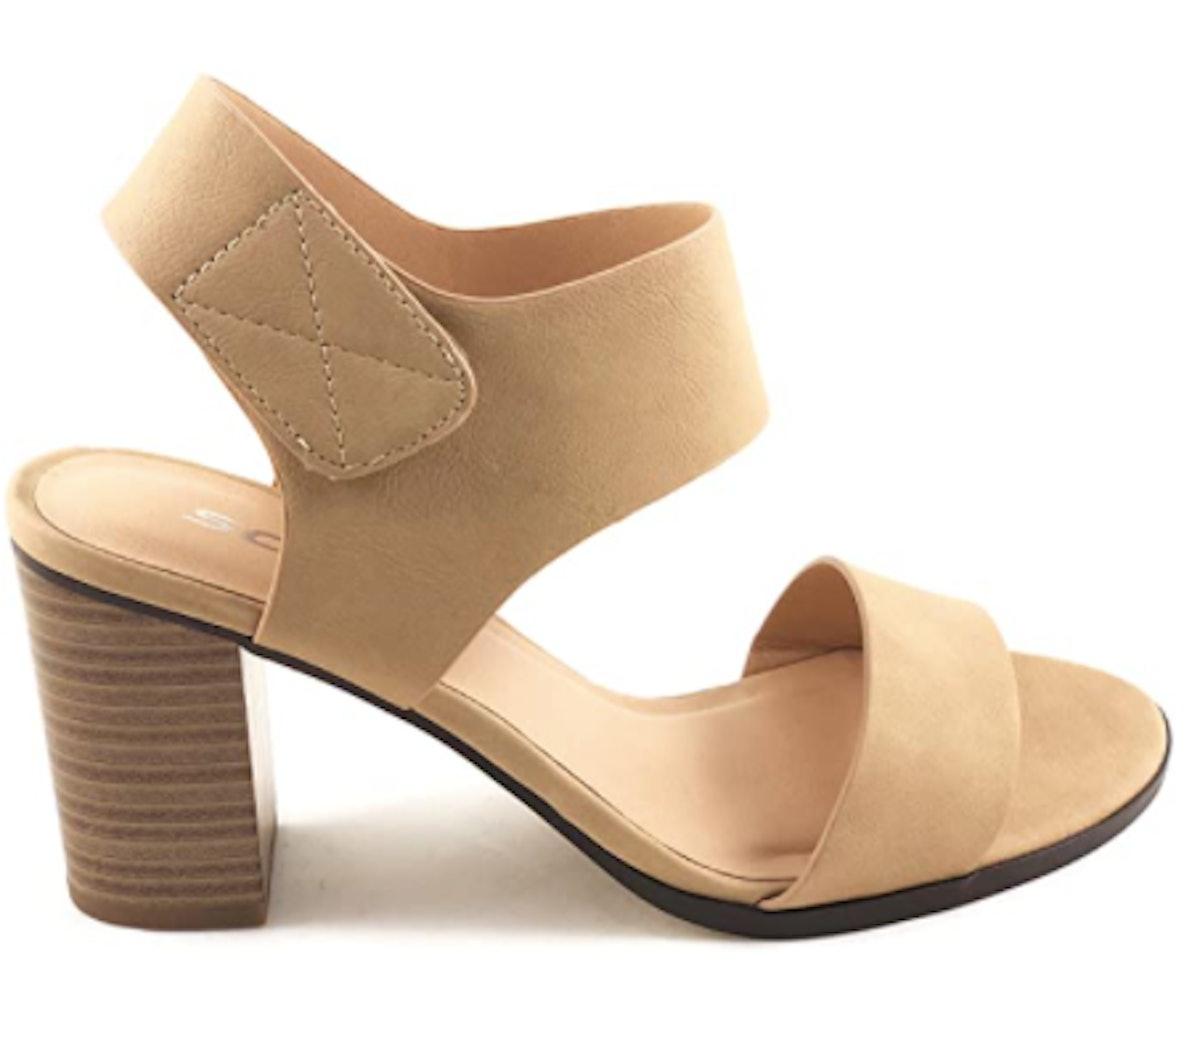 SODA Open Toe Block Heel Dress Sandals